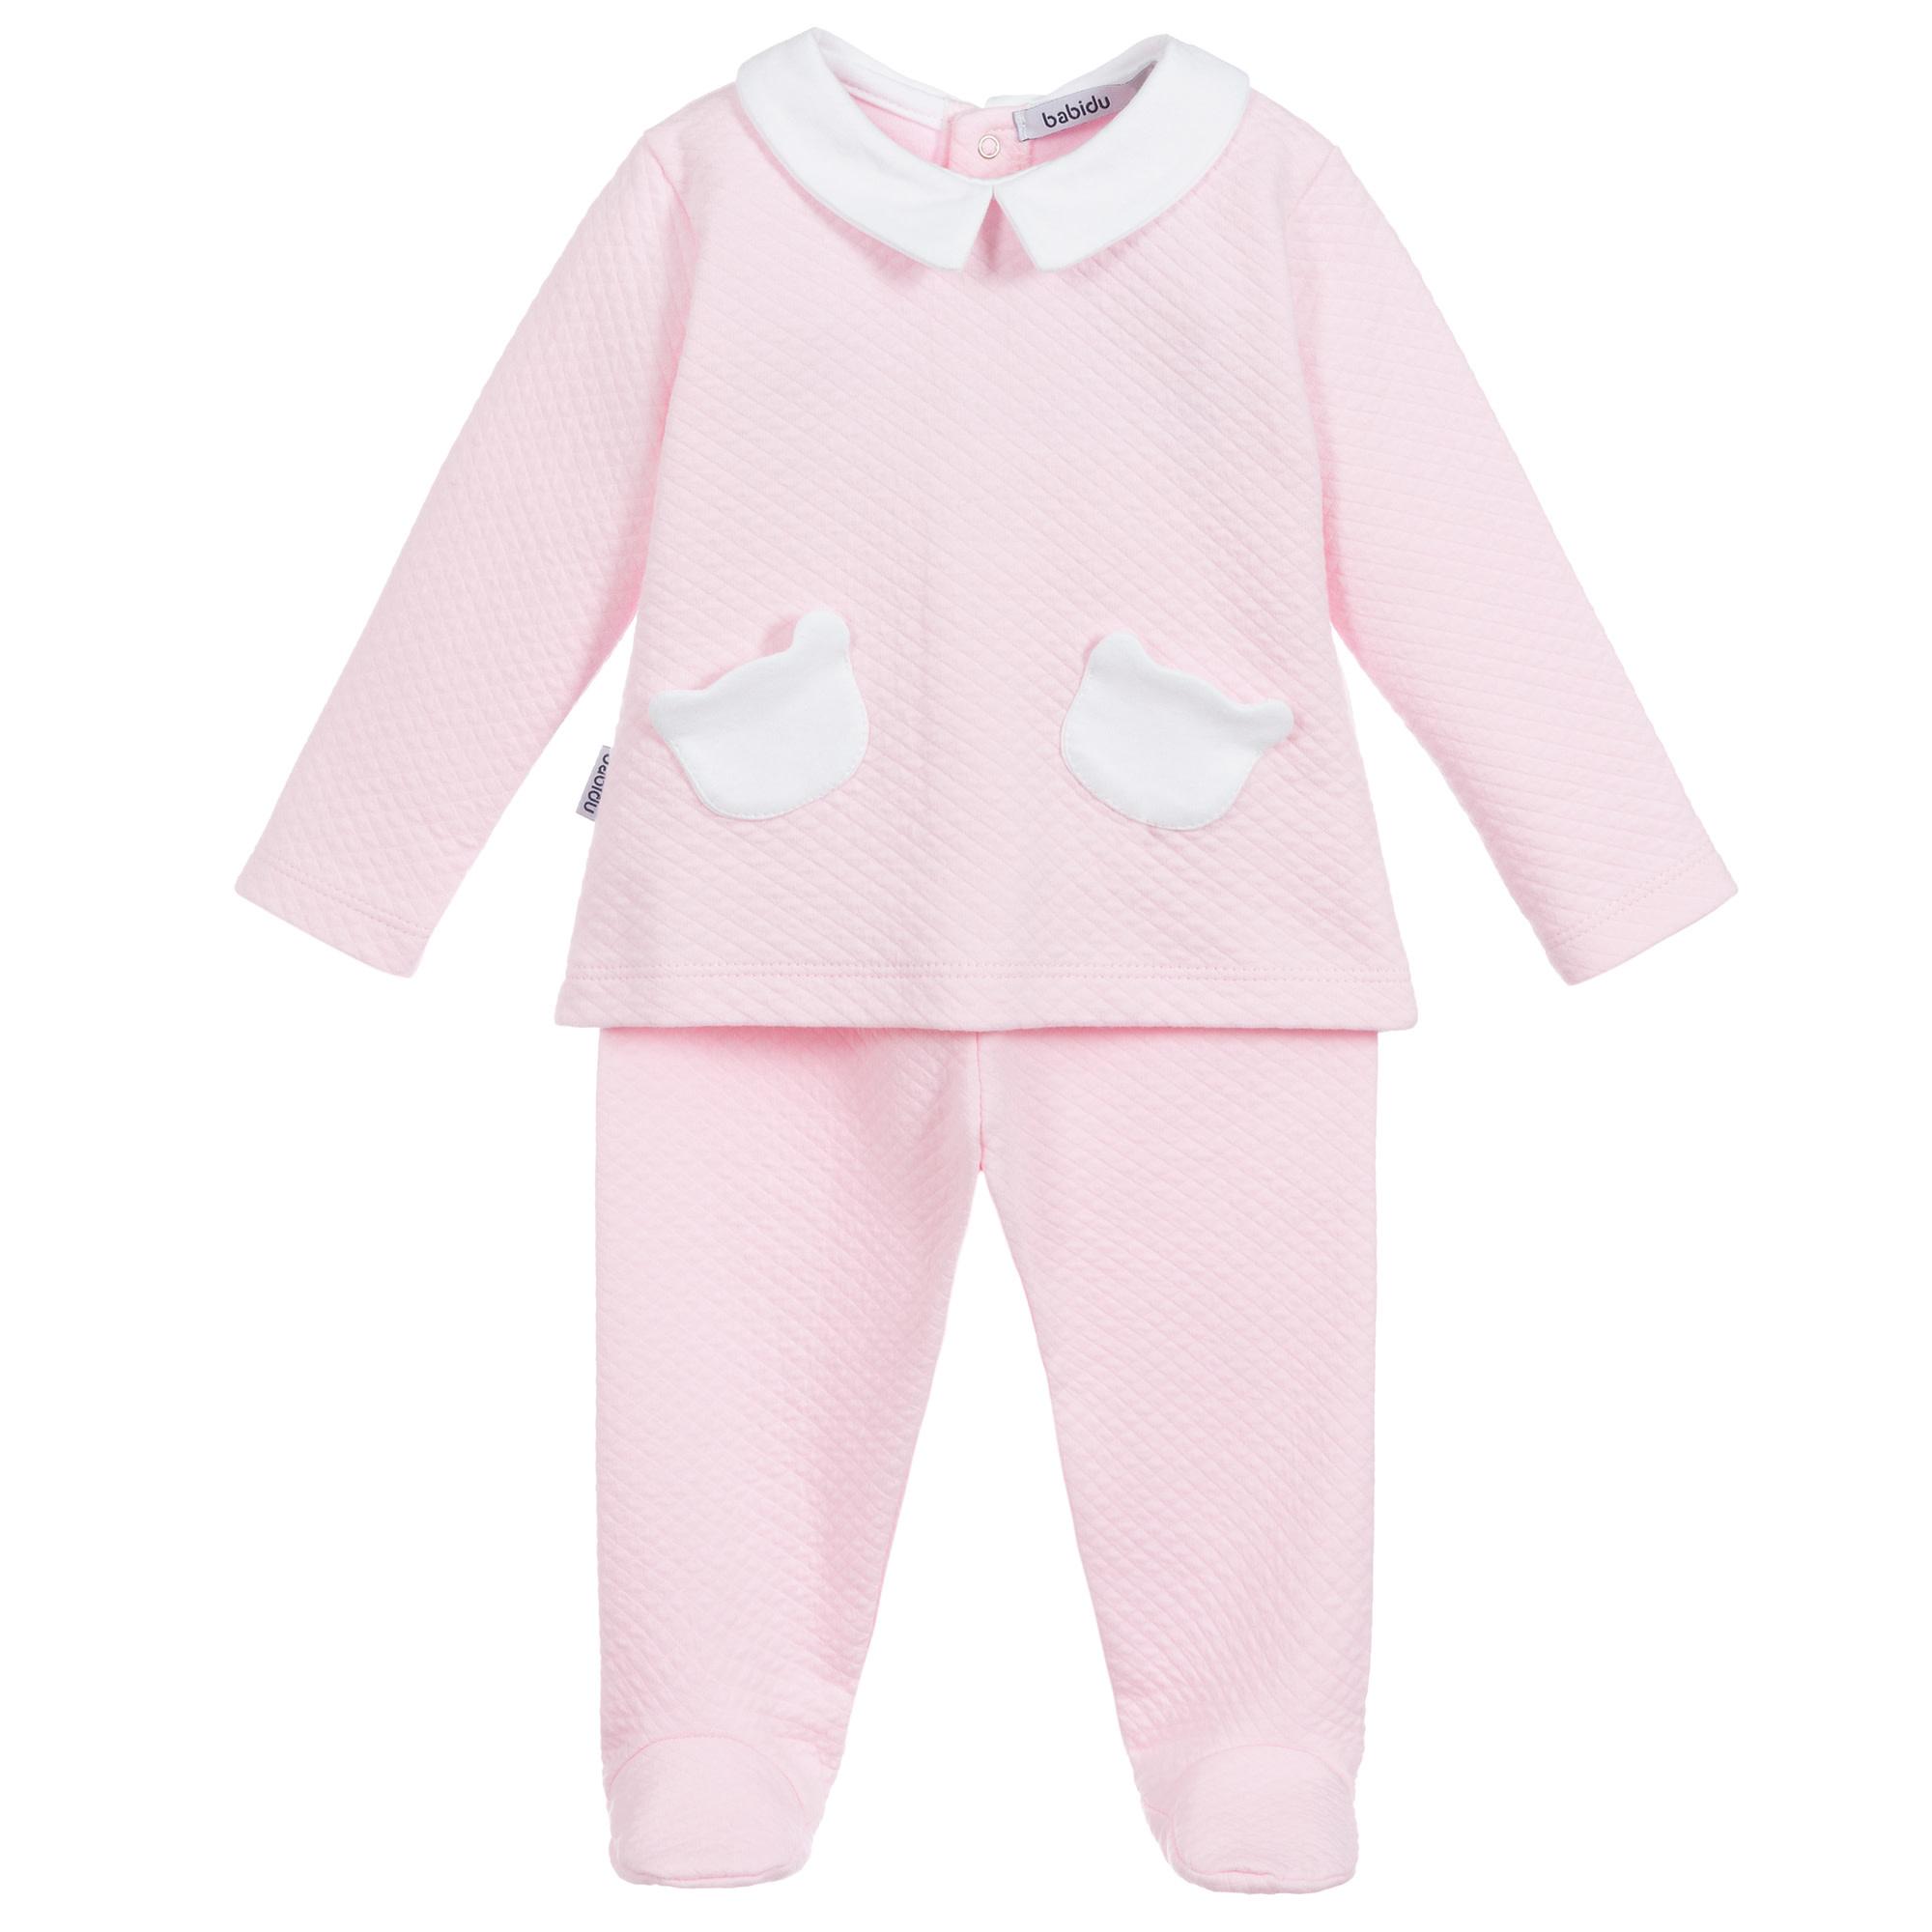 Babidu 54190 Pink Teddy Pockets 2 piece